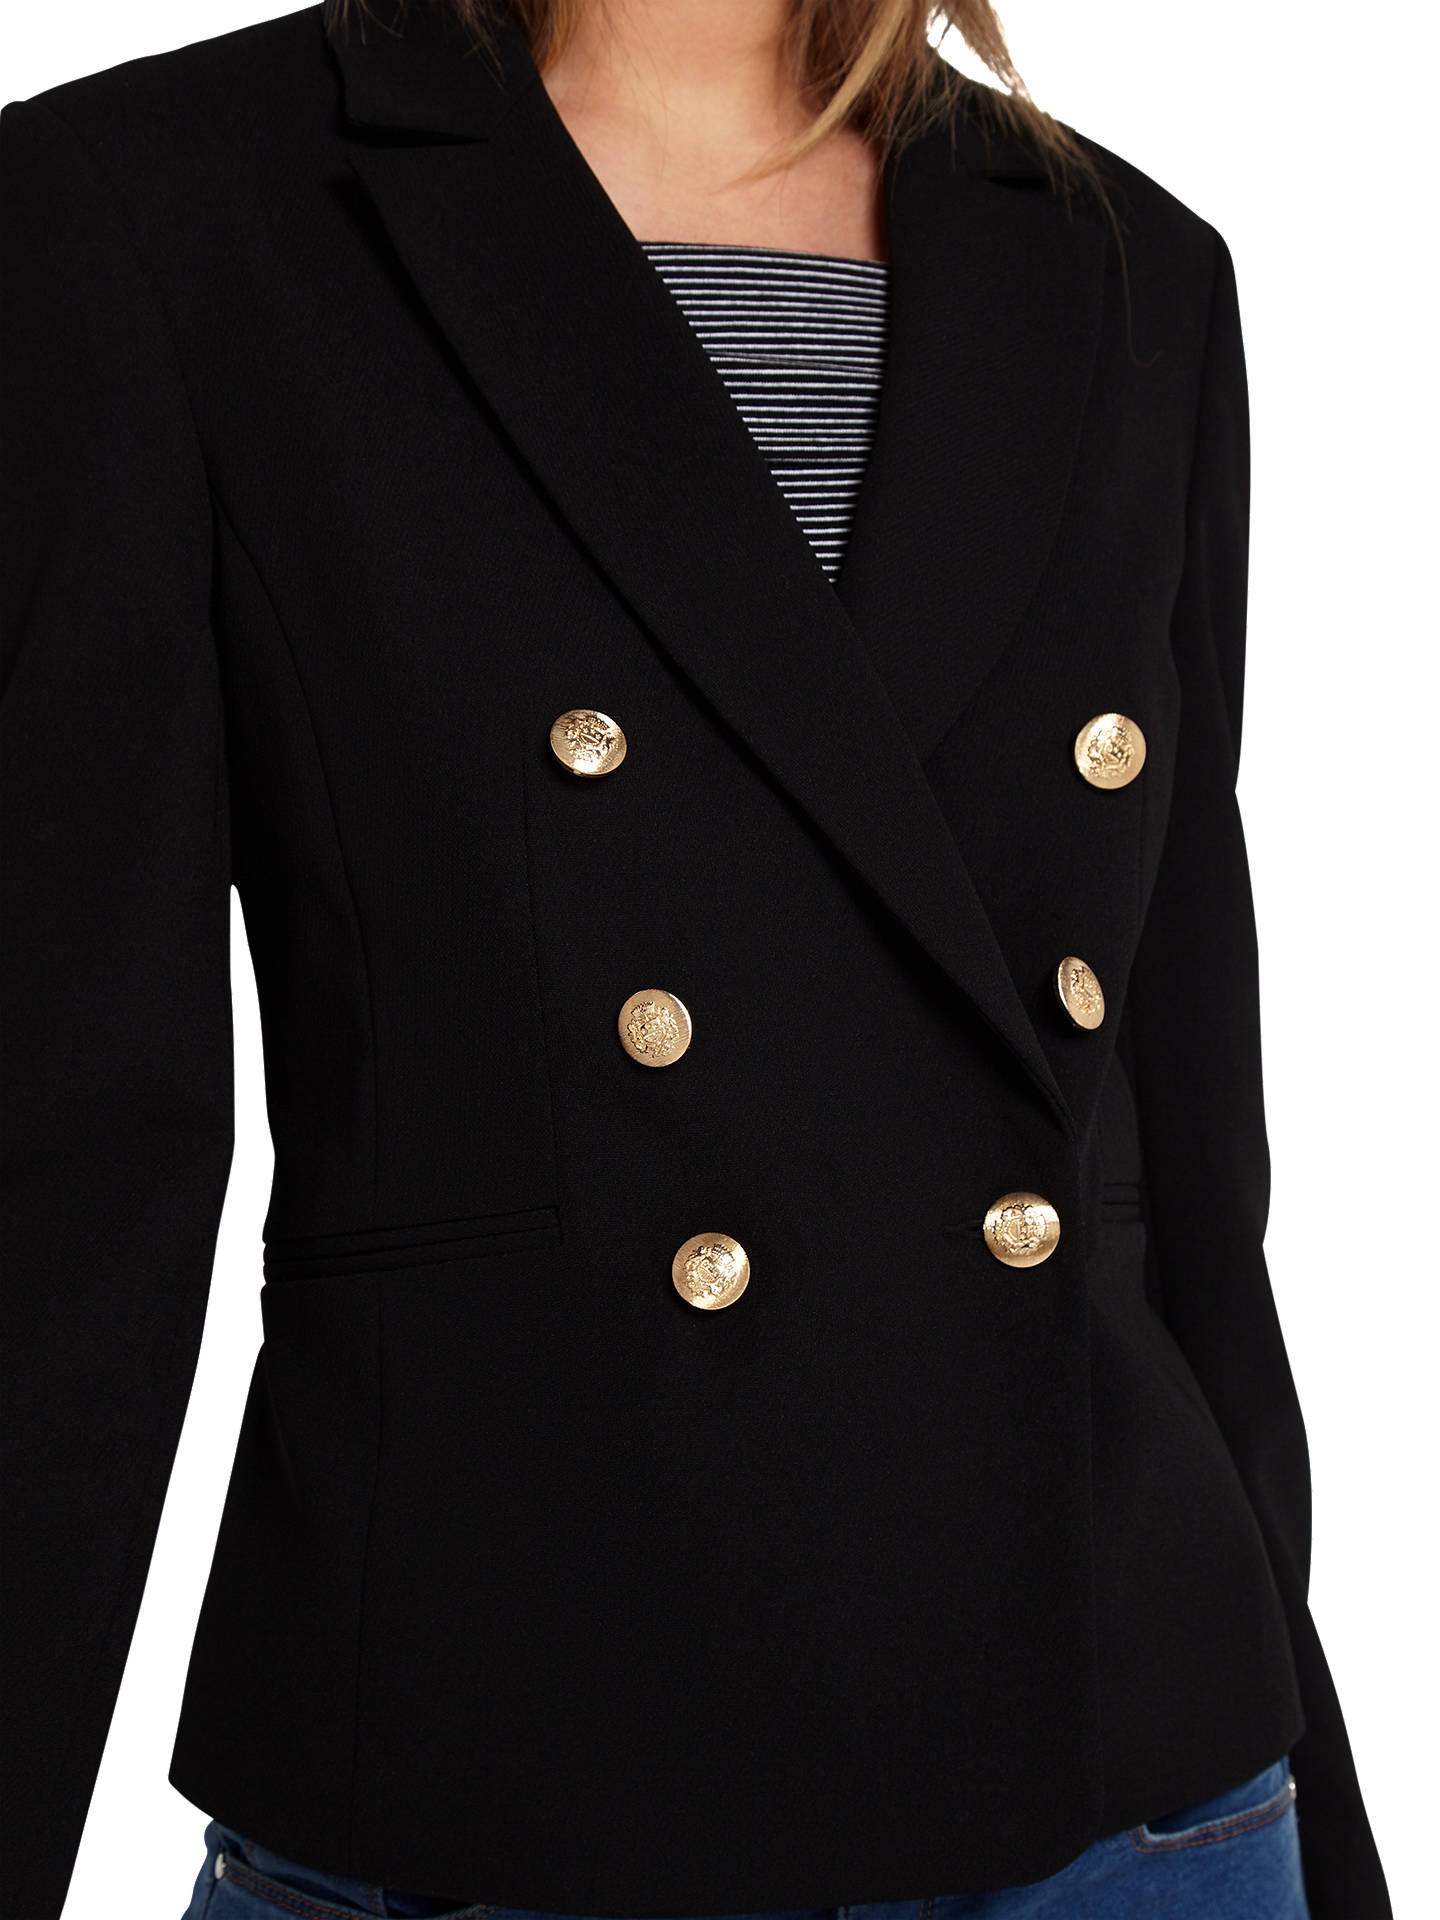 Miss Selfridge Military Jacket at John